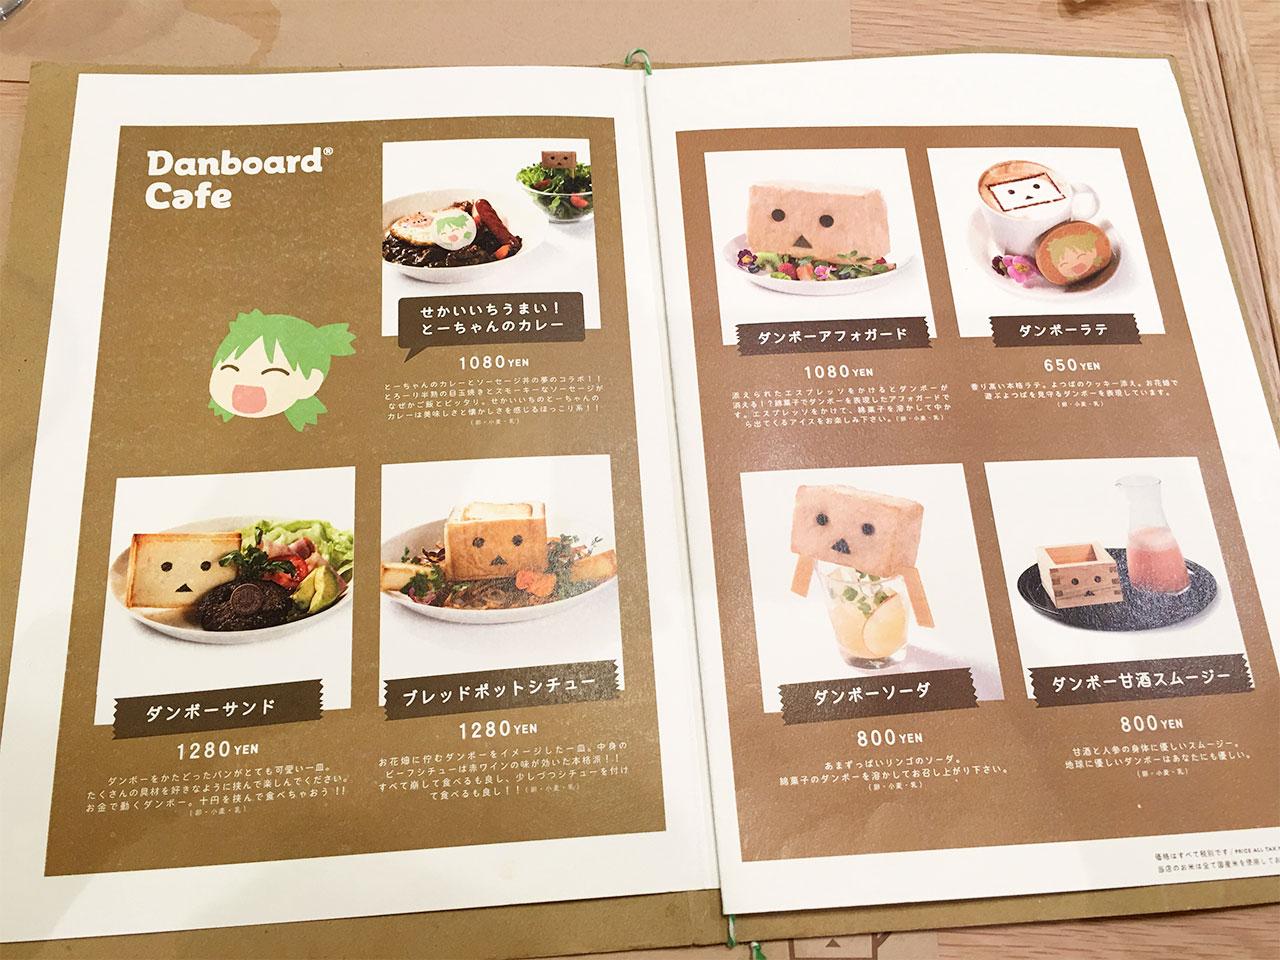 tachikawa-danboard-cafe-menu02